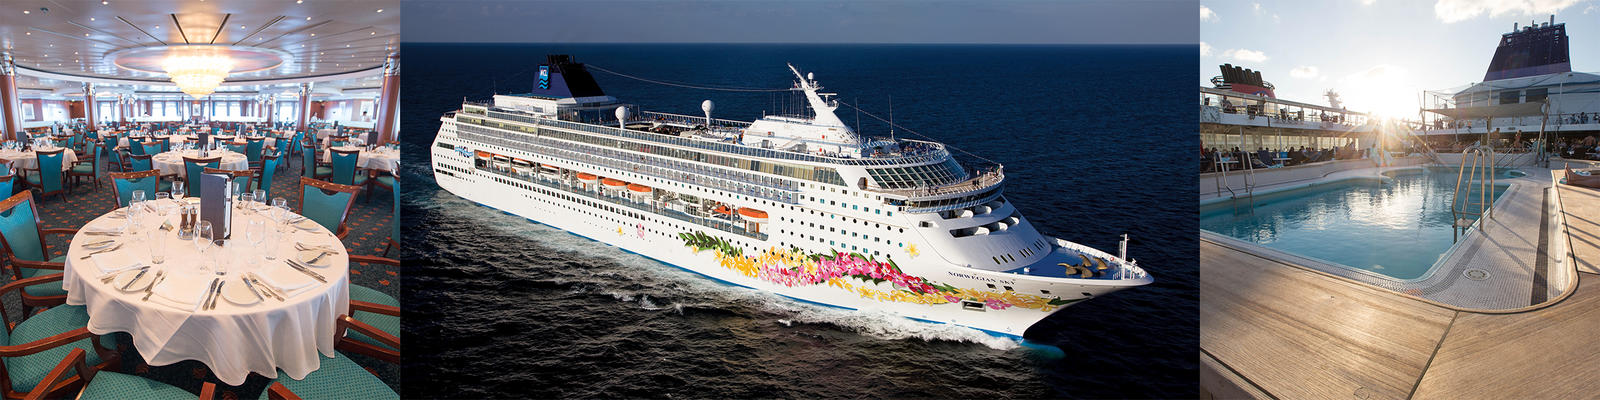 Norwegian Escape Cruise Ship Review Photos Departure Ports On - Cruise ship crew quarters